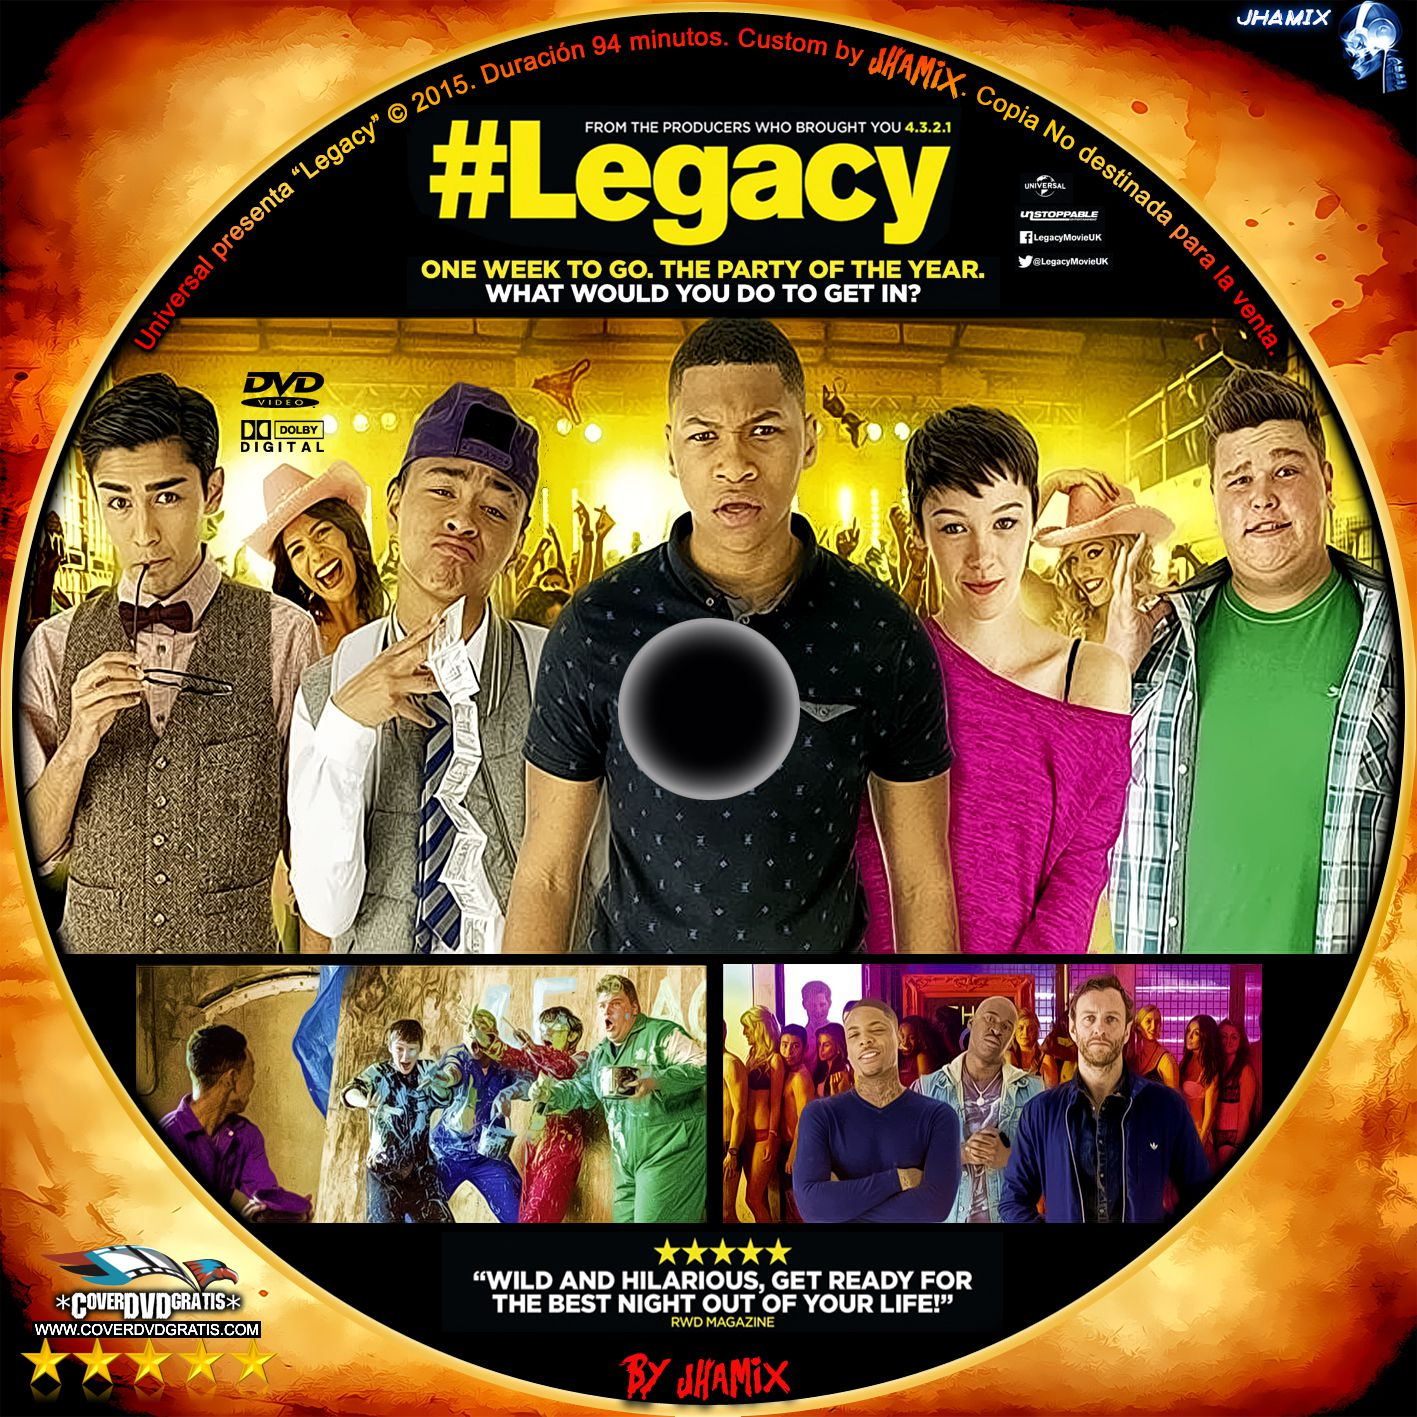 Legacies Dvd